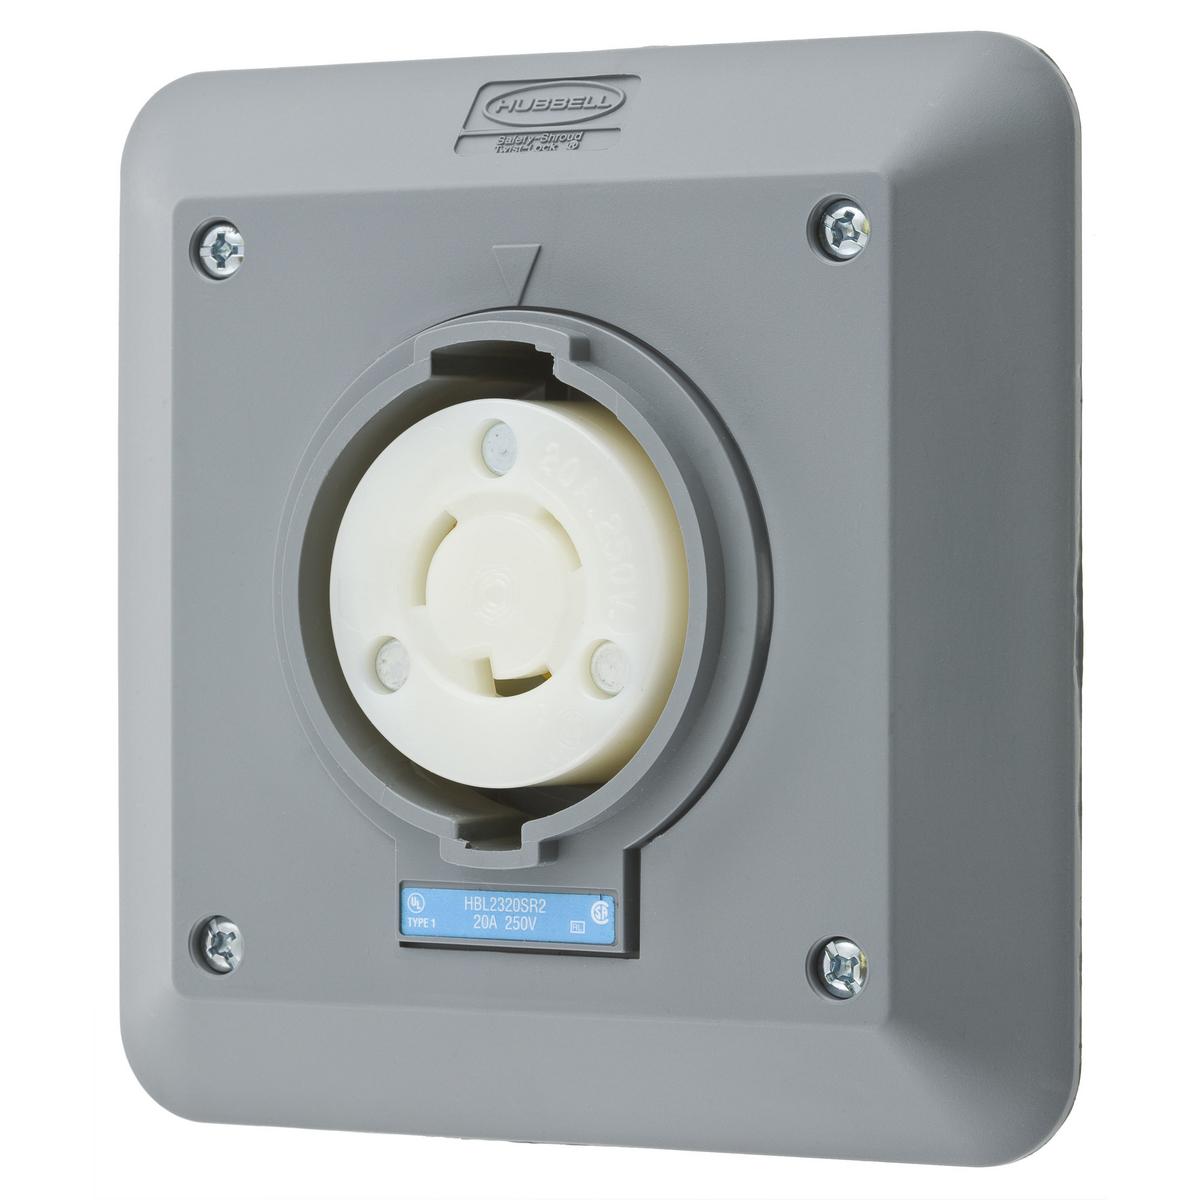 Hbl2320sr2 Brand Wiring Device Kellems